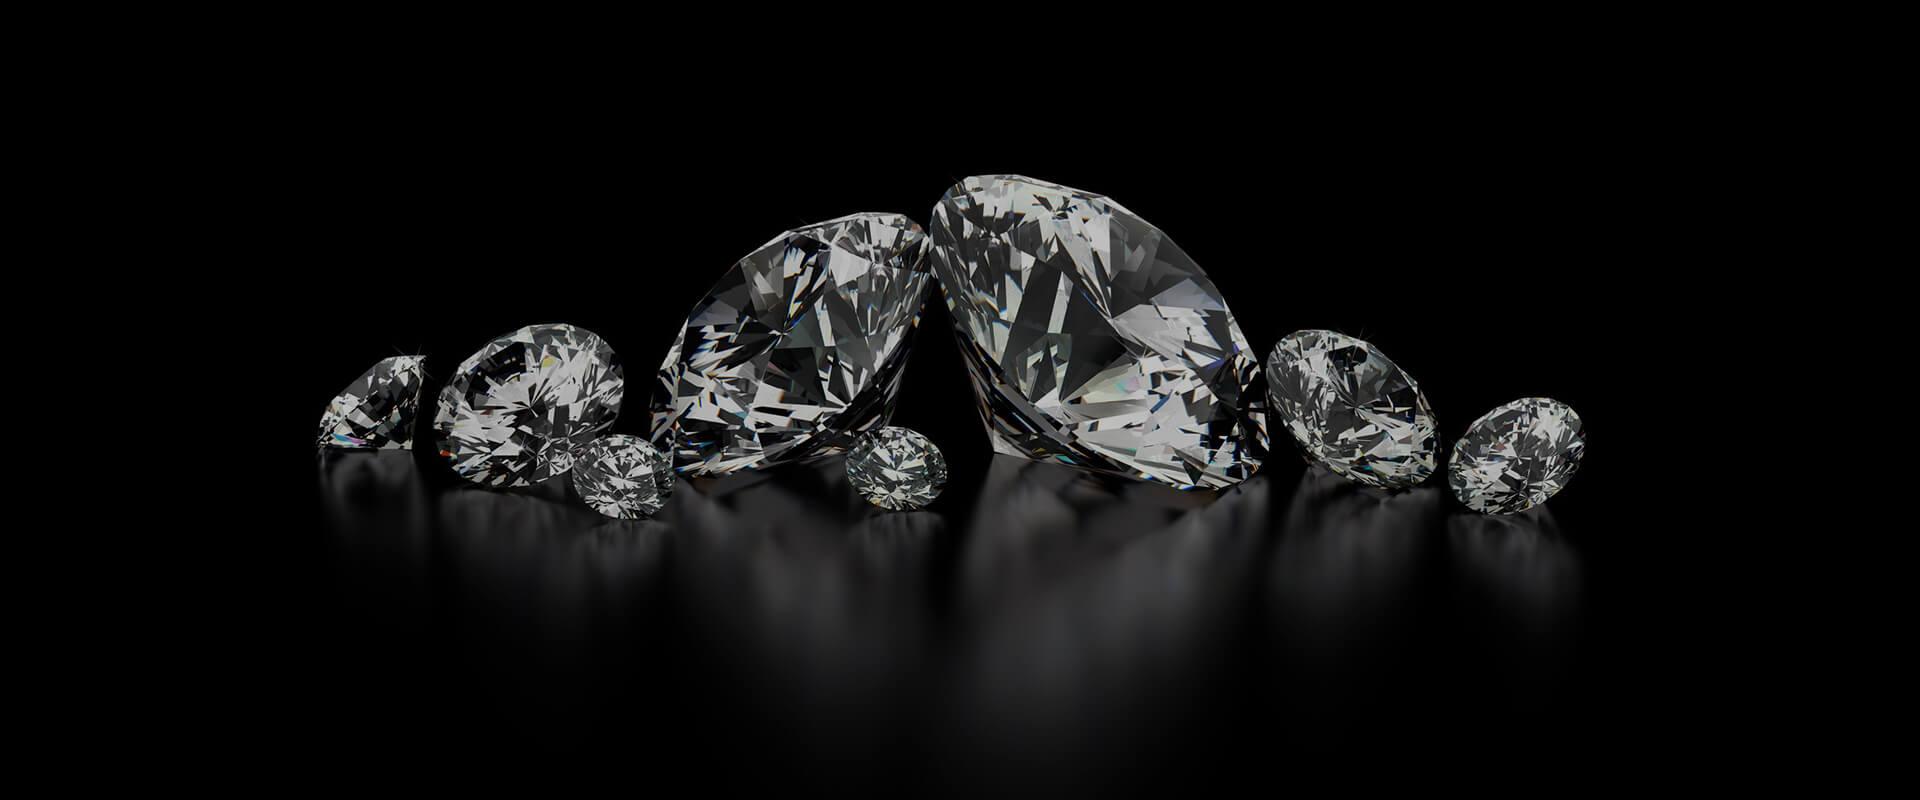 Diamond: A Piece of History